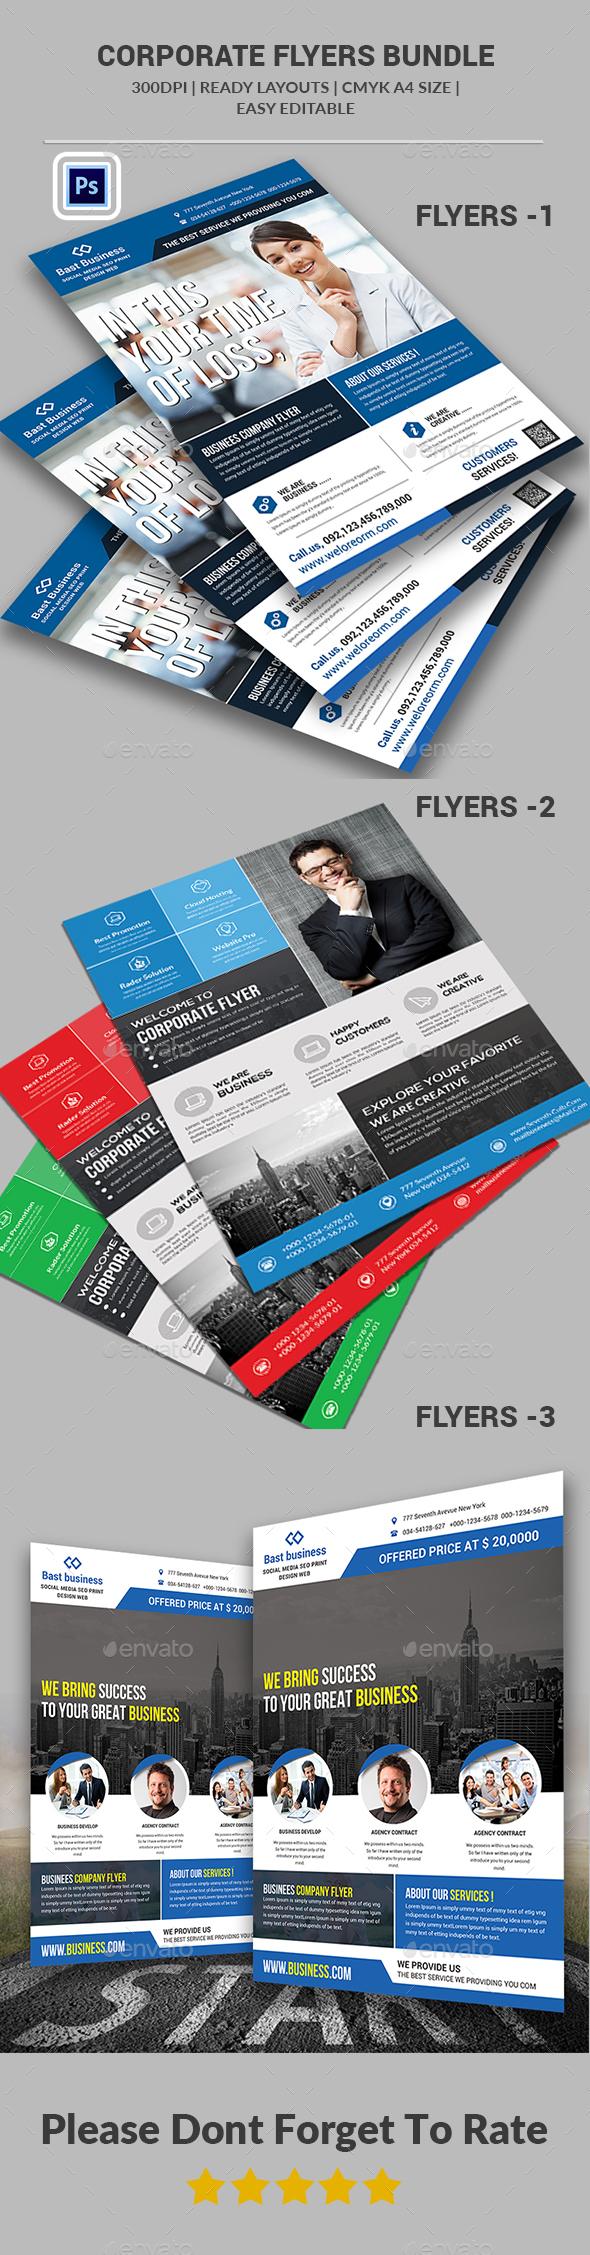 Business Flyers Bundle Templates - Corporate Flyers